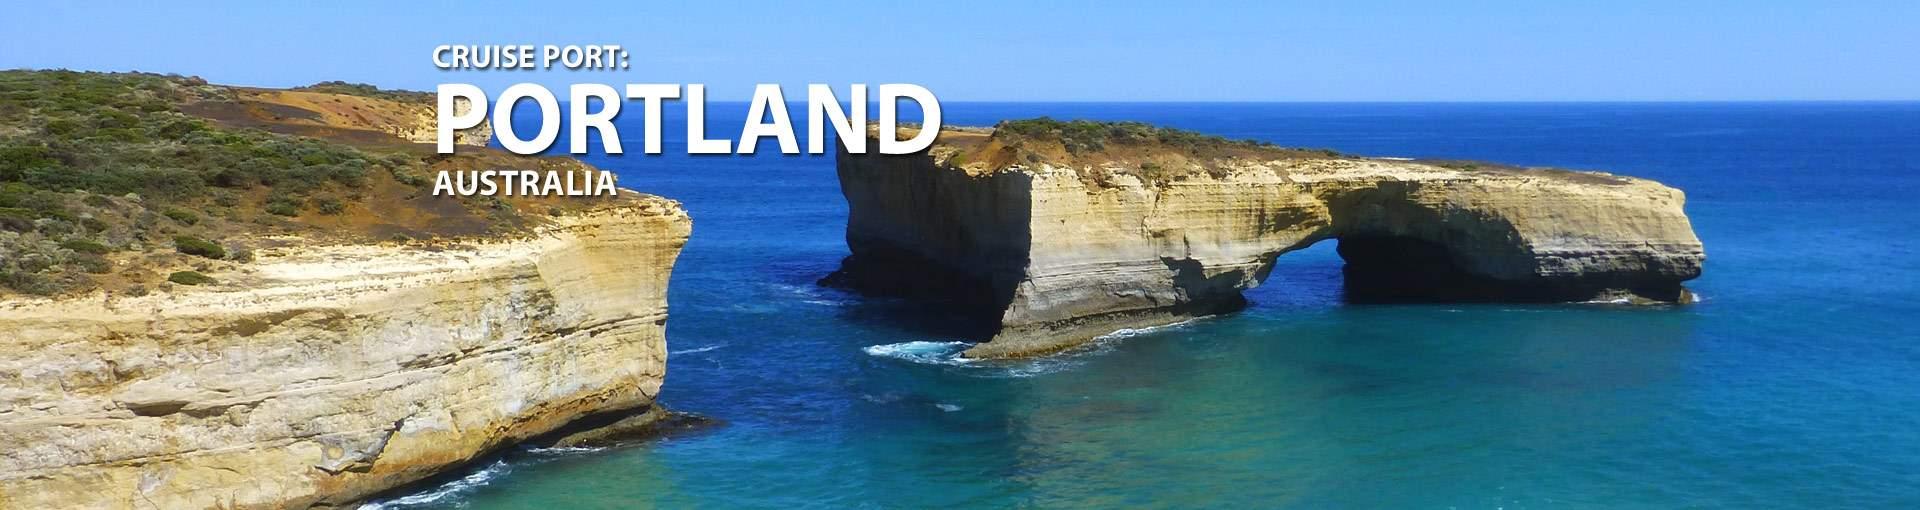 Portland, Australia Cruise Port